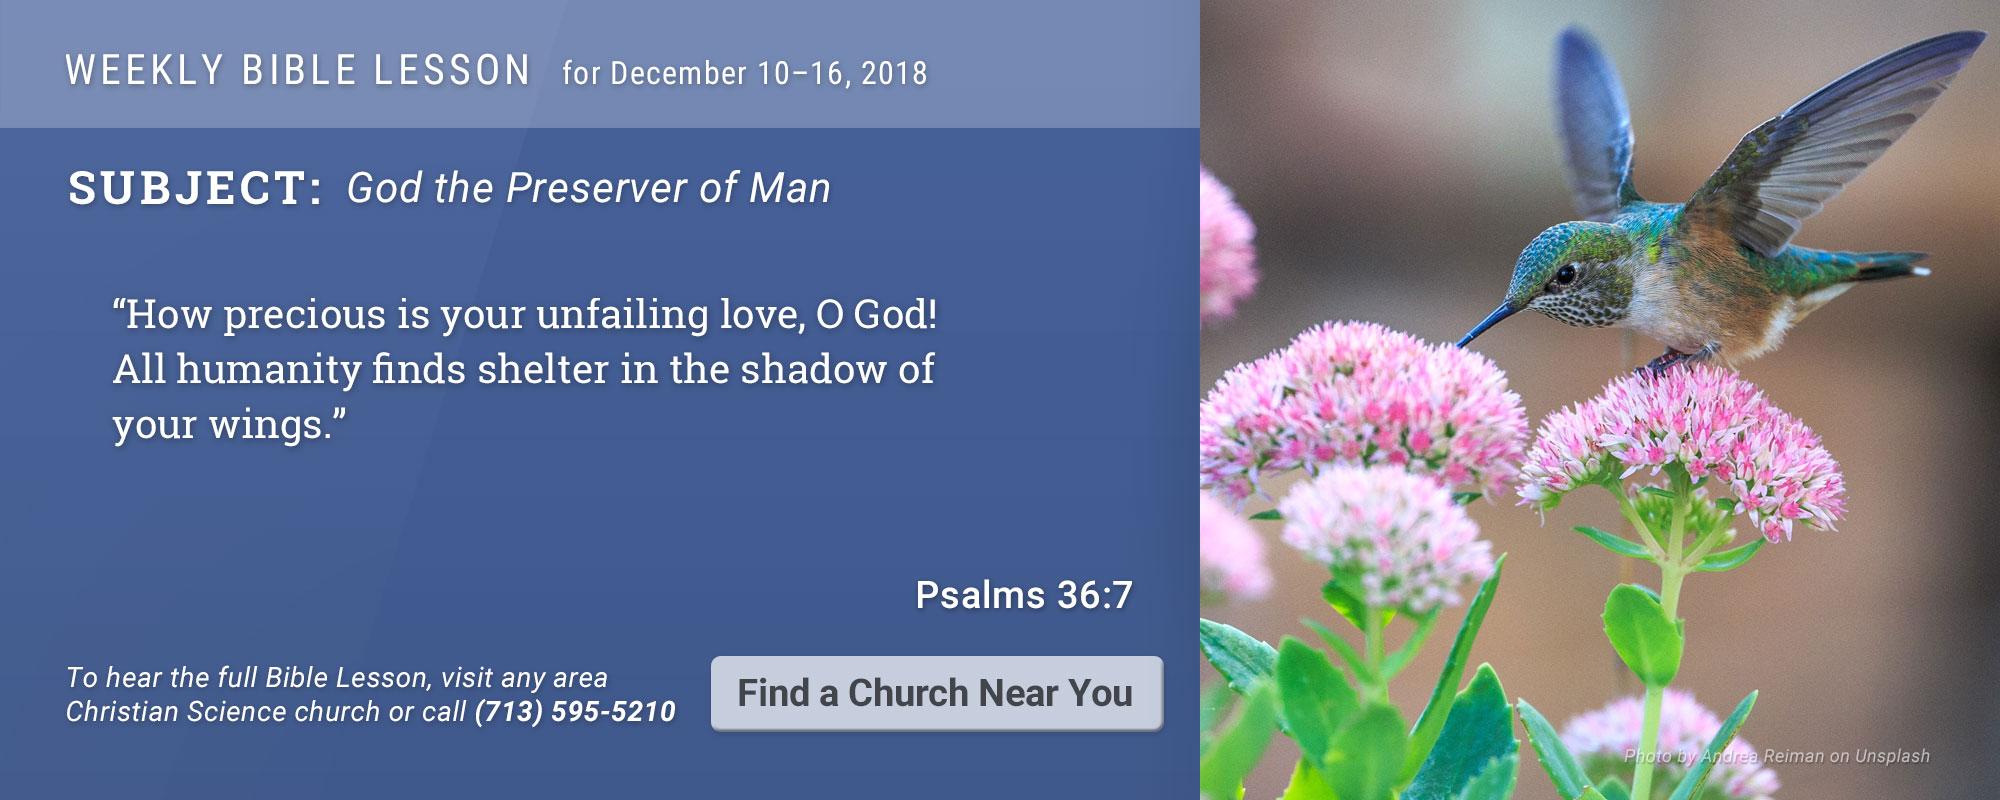 Bible Lesson Golden Text 20181210